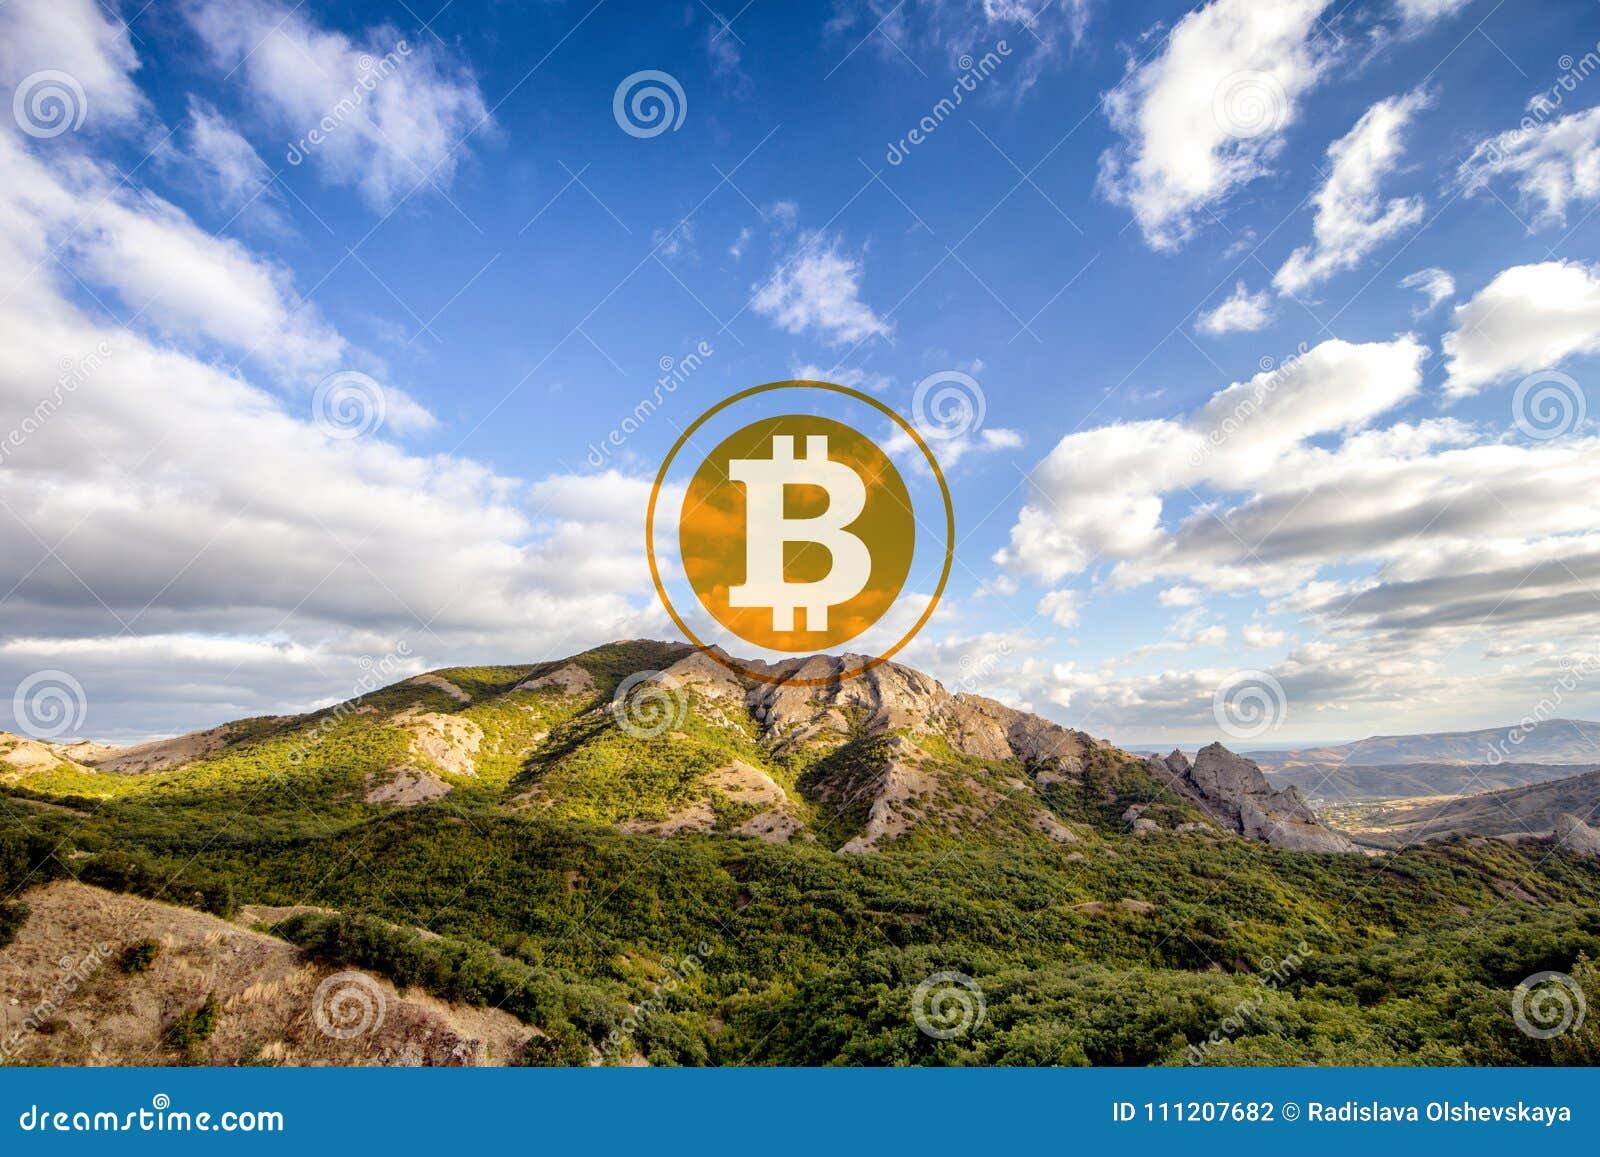 Bitcoin на верхней части горы